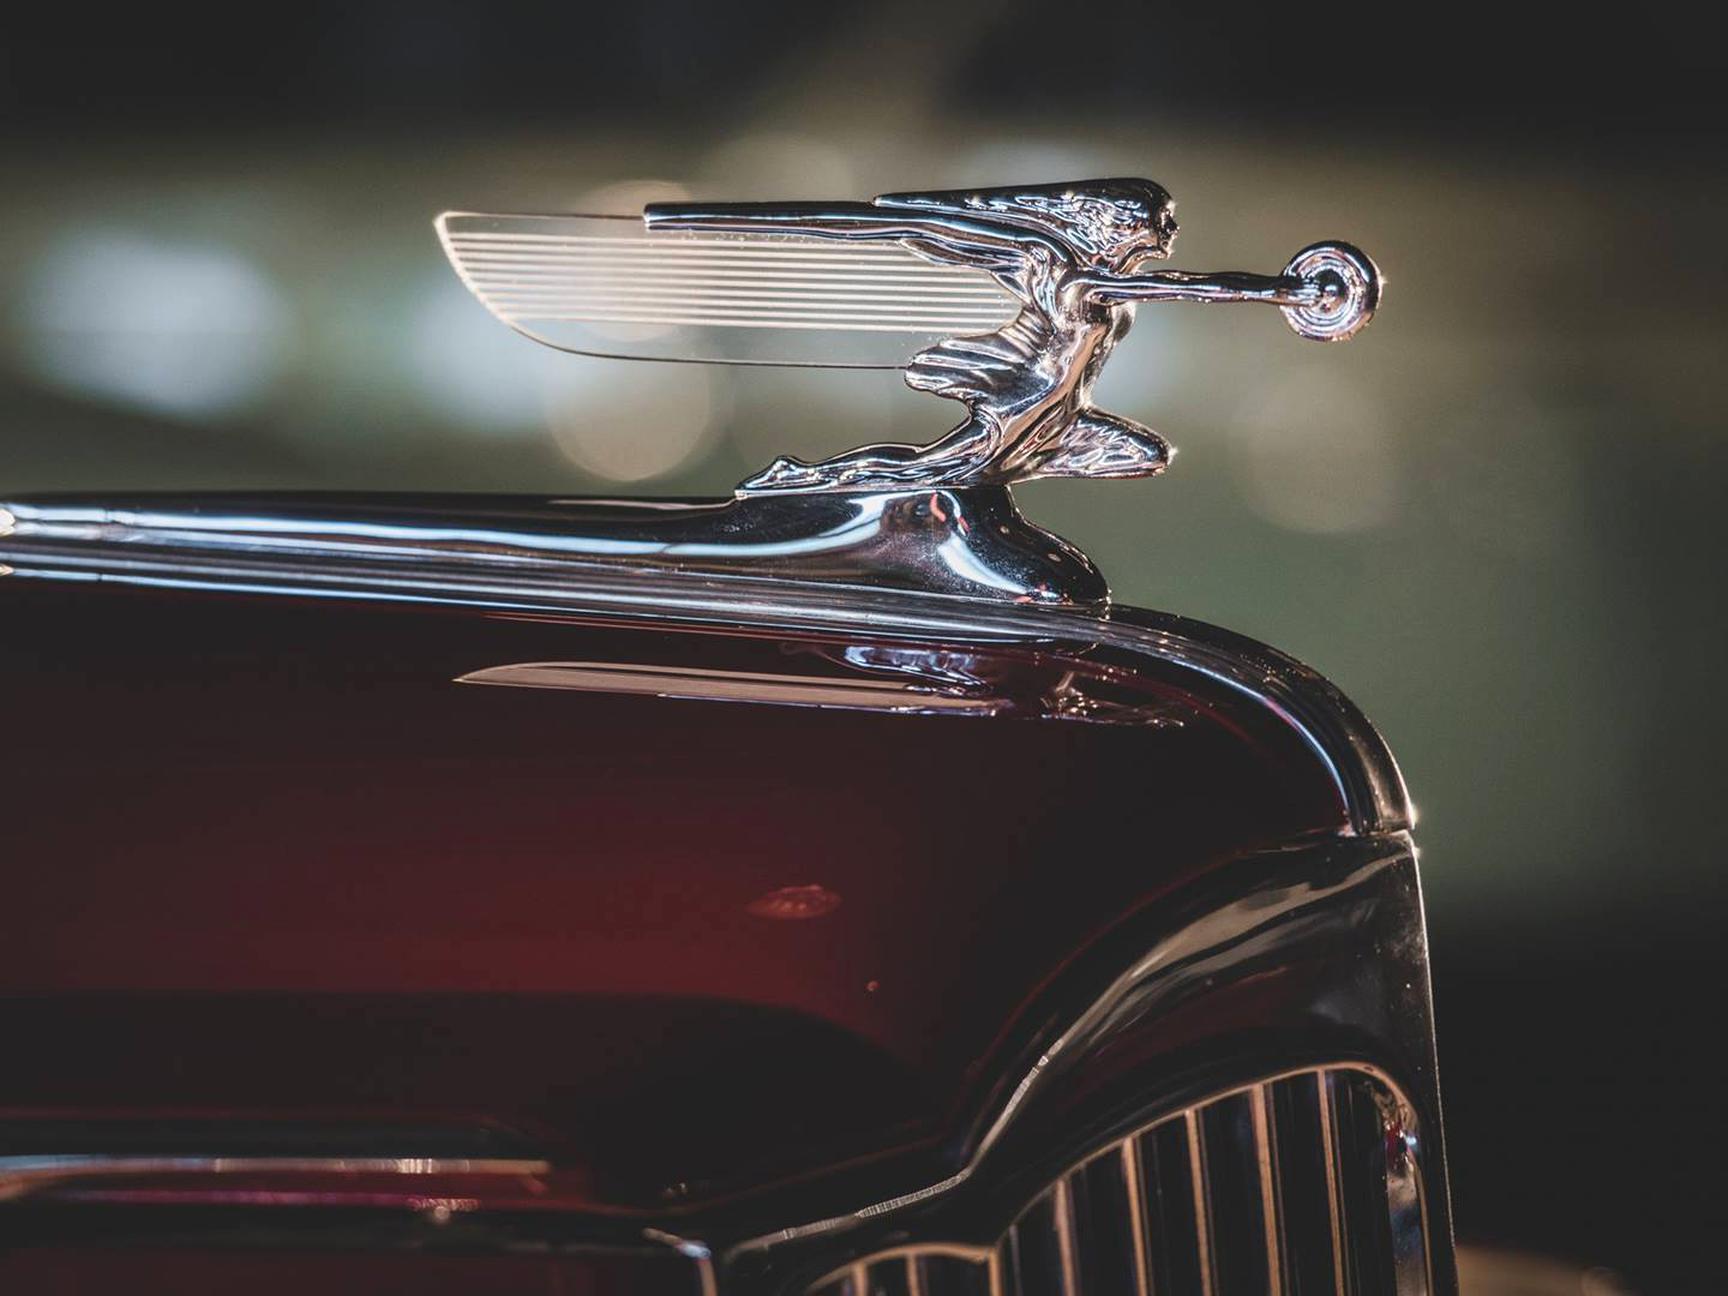 Yissma 3D Emblem Car Logo Front Hood Ornament Car Cover Chrome Eagle Badge for Car Auto